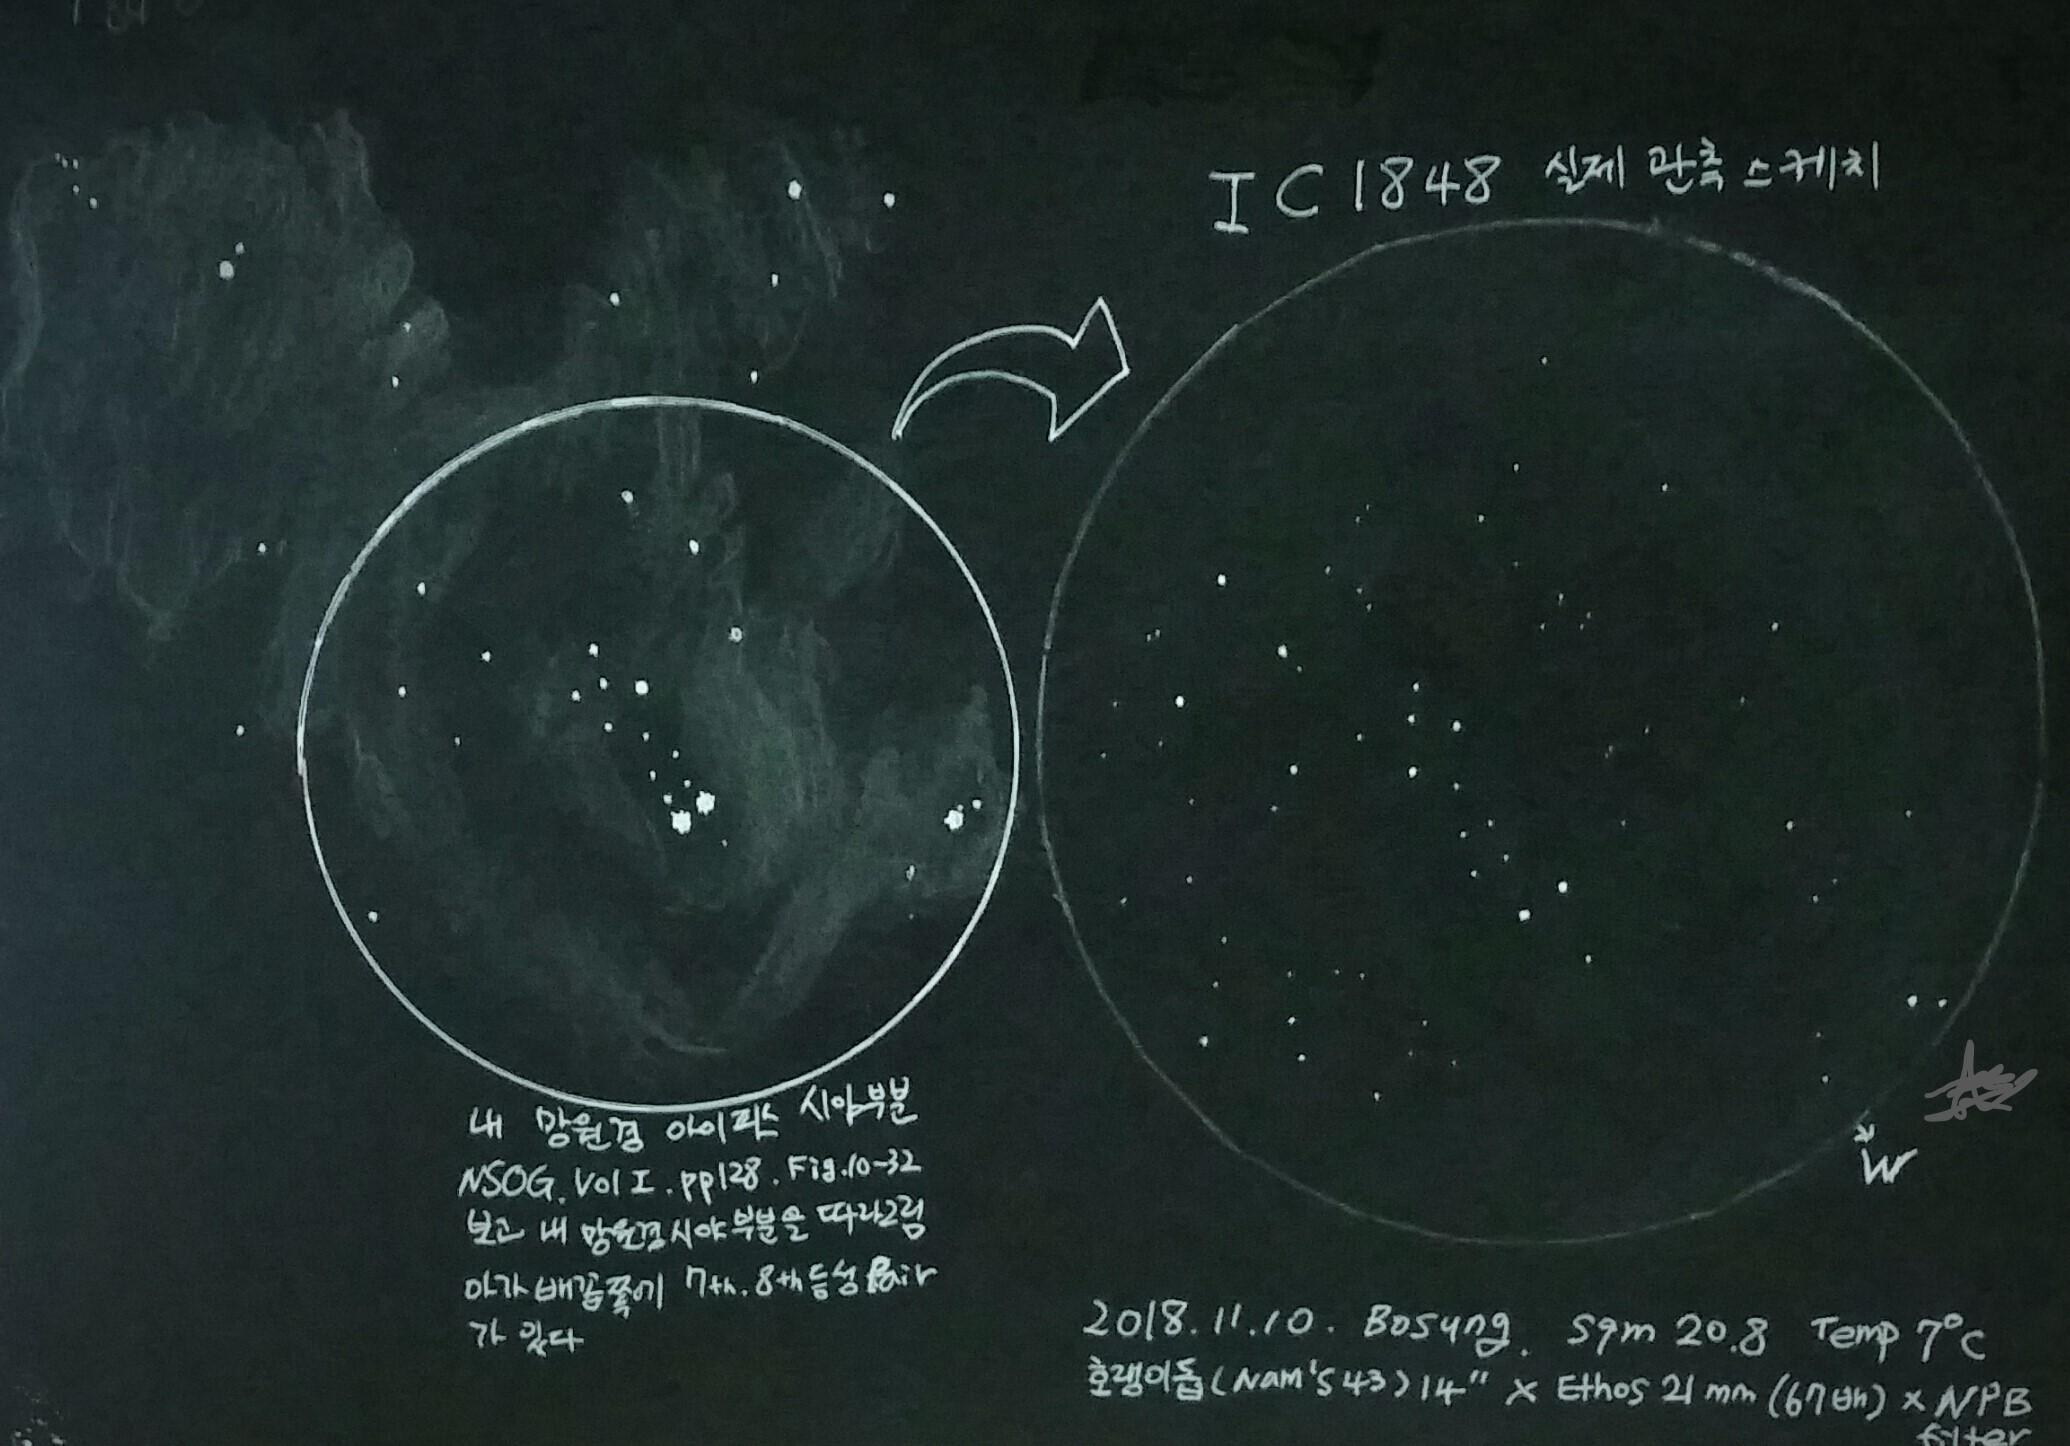 IC1848.jpg